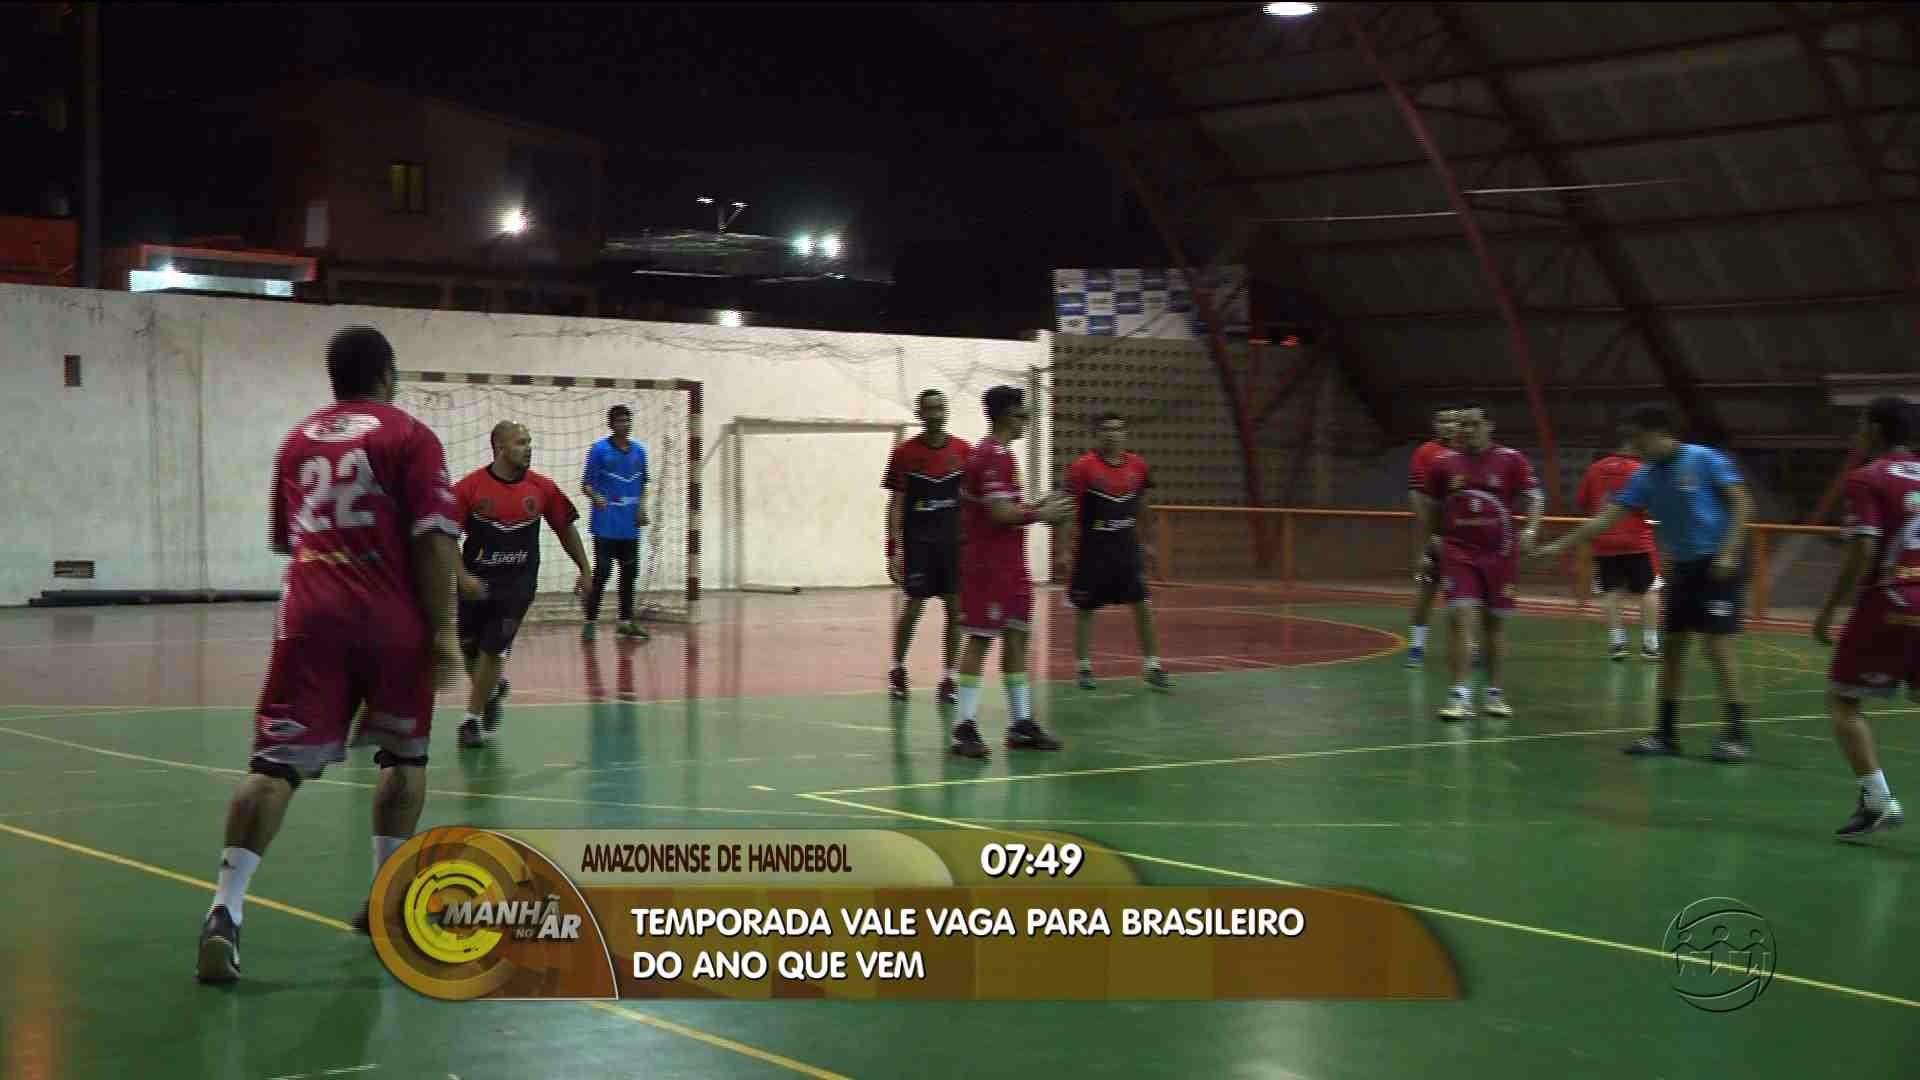 CAMPEONATO AMAZONENSE DE HANDEBOL VALE VAGA PARA CAMPEONATO BRASILEIRO 2018 - Manhã no Ar 15/08/17